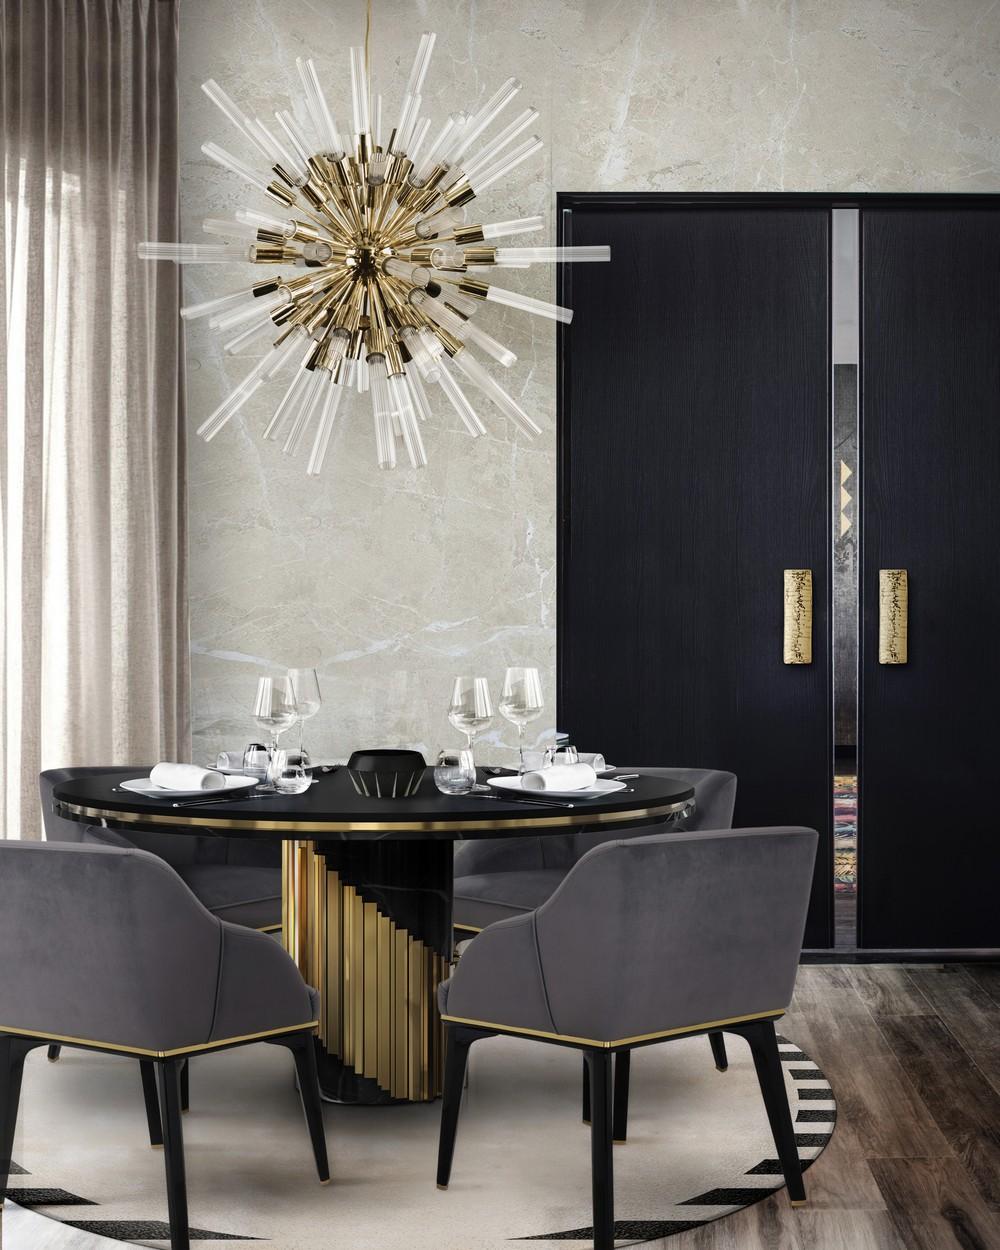 Interior Design Ideas on How to Make Darker Interiors Brighter 6 interior design ideas Interior Design Ideas on How to Make Darker Interiors Brighter Interior Design Ideas on How to Make Darker Interiors Brighter 6